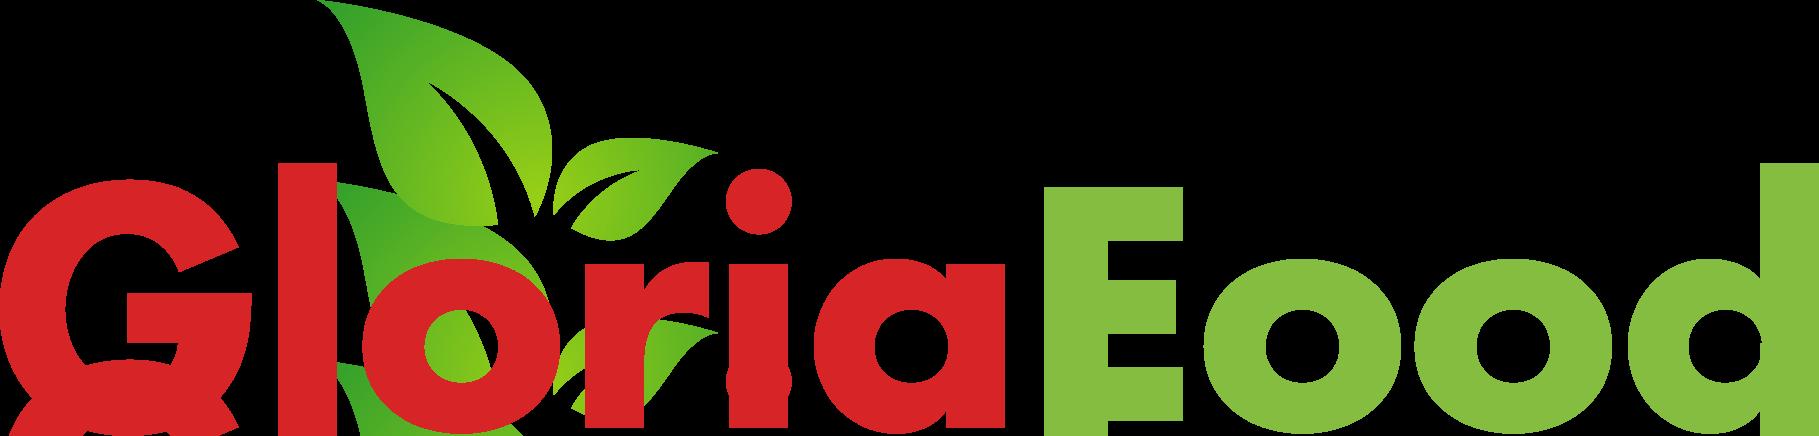 Gloria Food logo